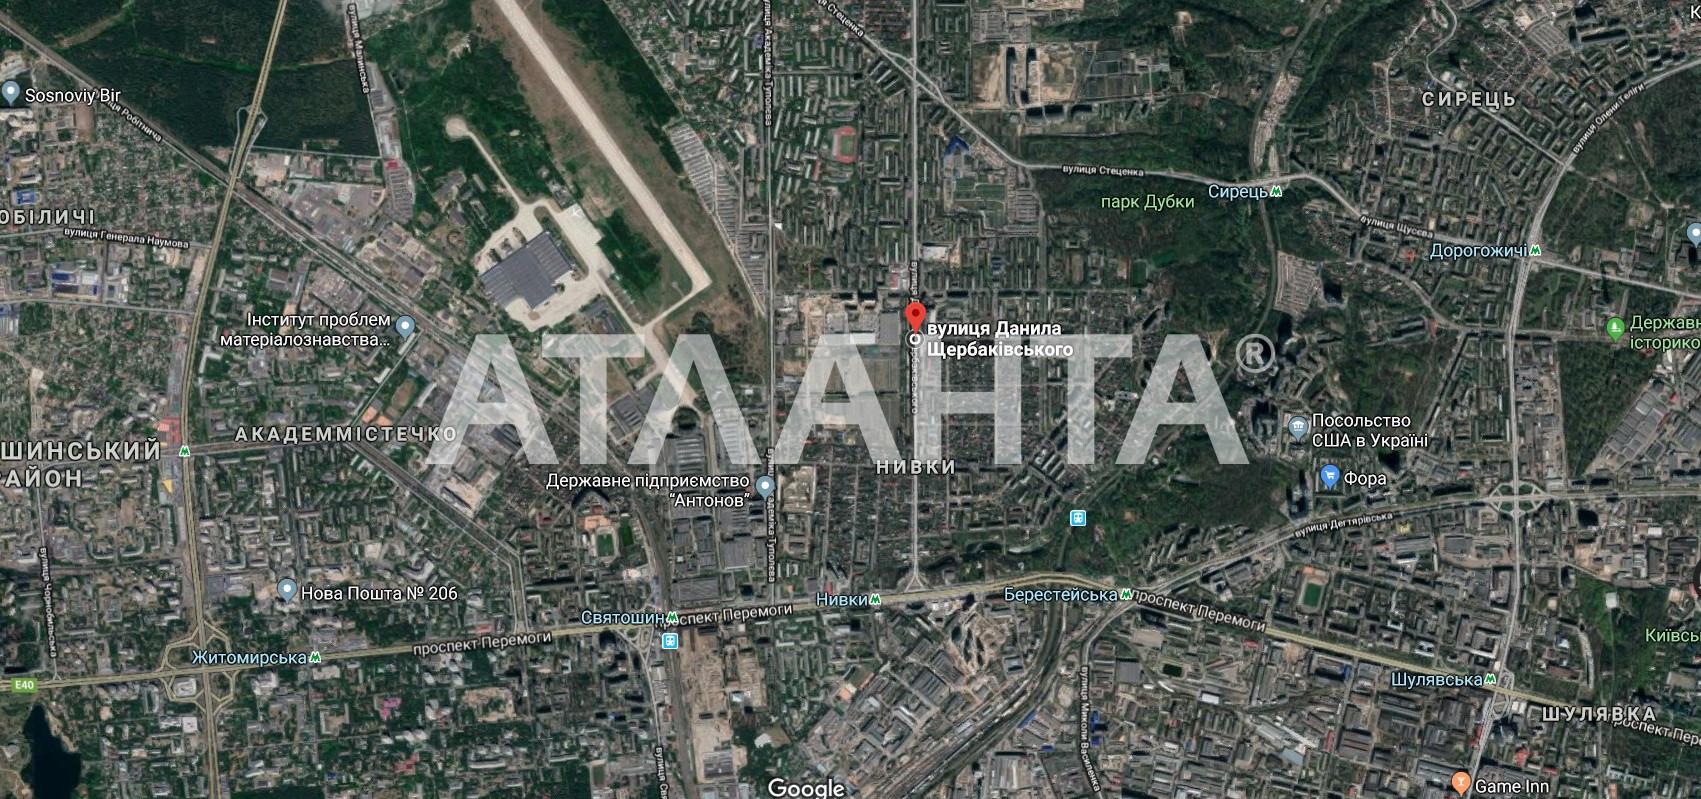 Продается 2-комнатная Квартира на ул. Ул. Щербаковского — 39 000 у.е. (фото №6)